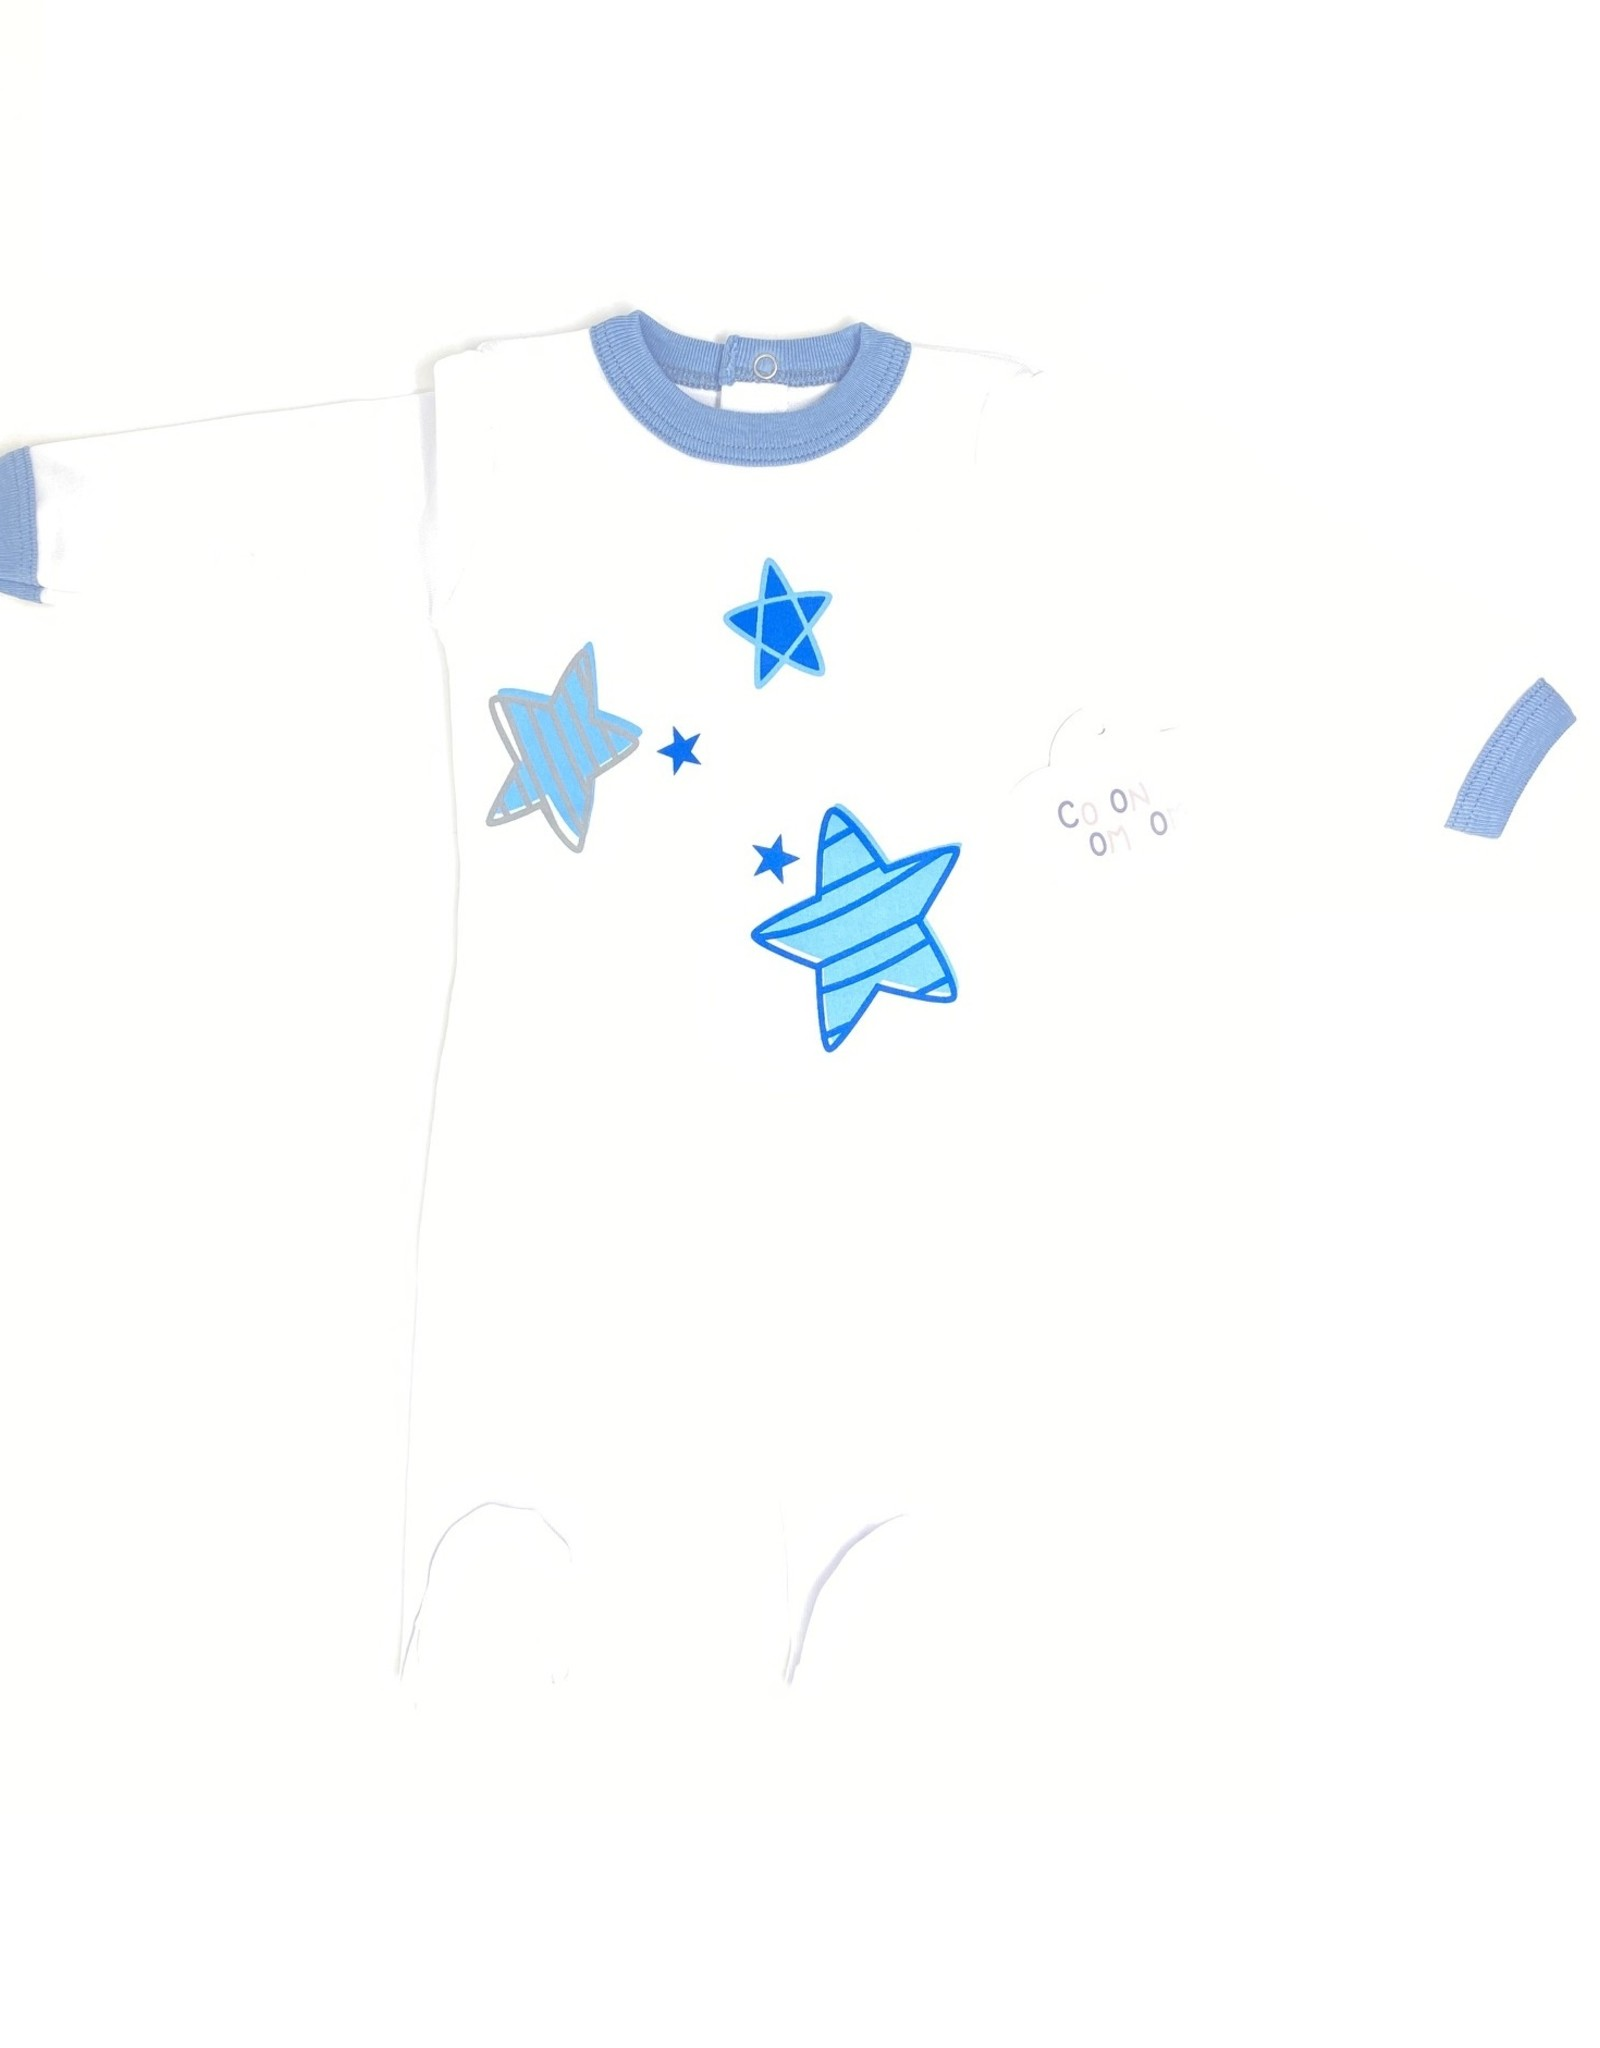 Coton PomPom Coton PomPom Heart/Star Doodles Footie